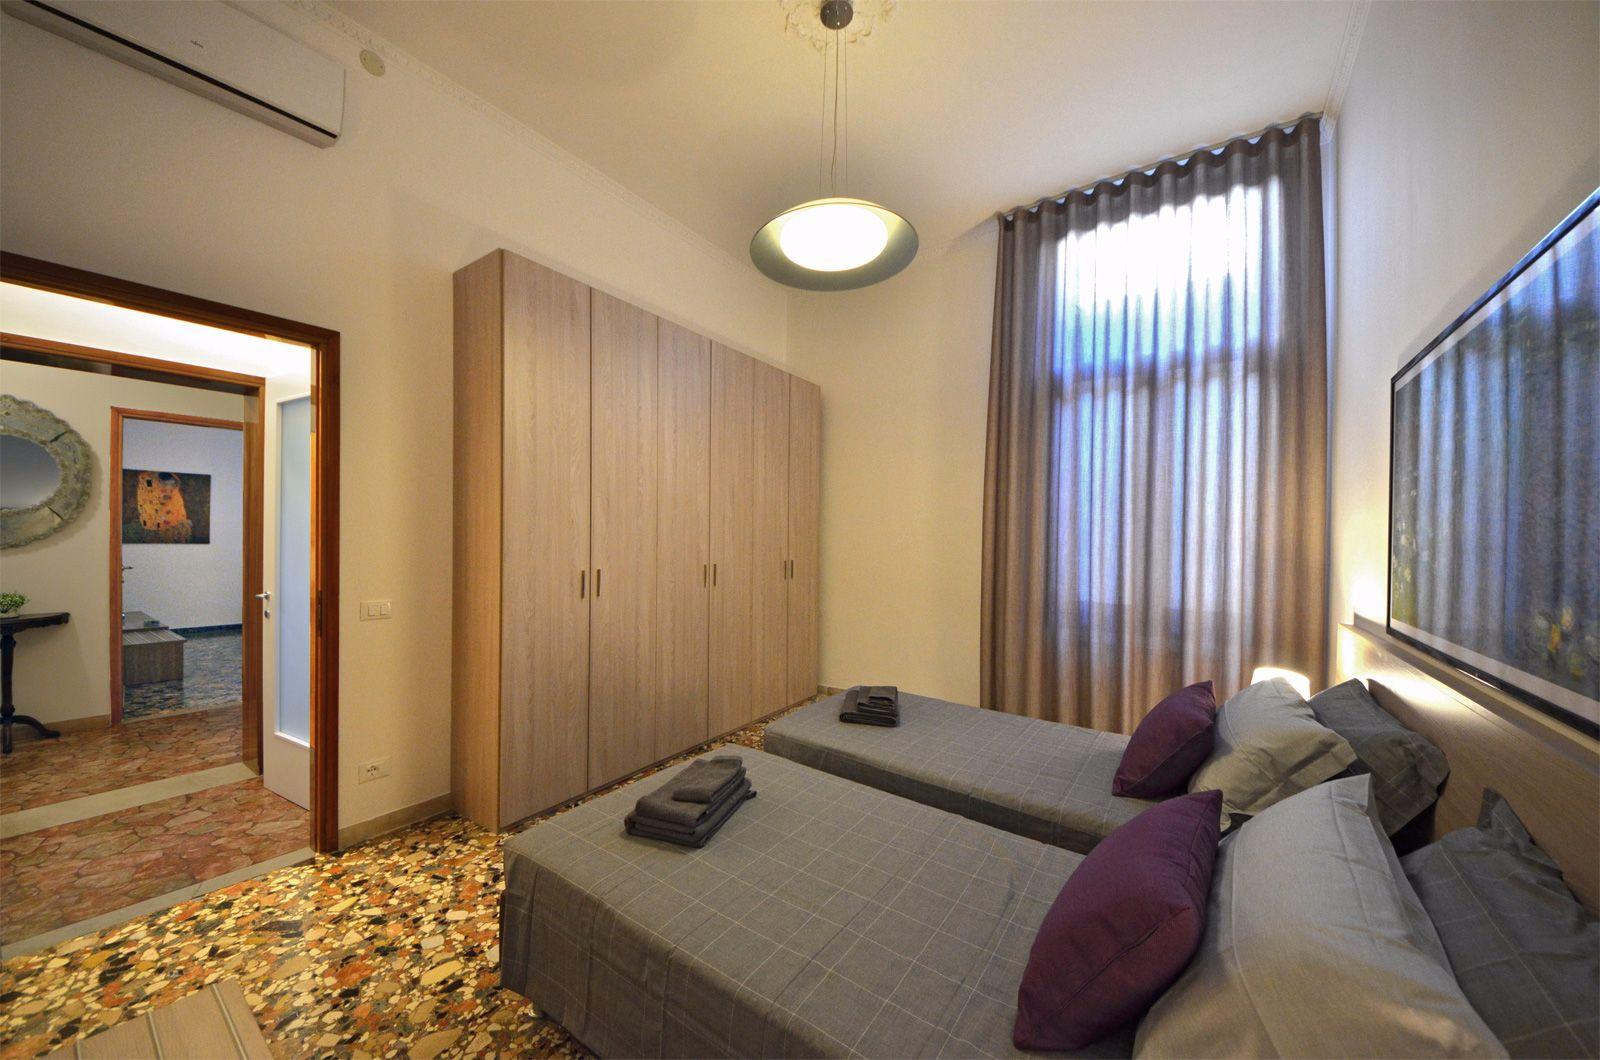 second bedroom, very spacious